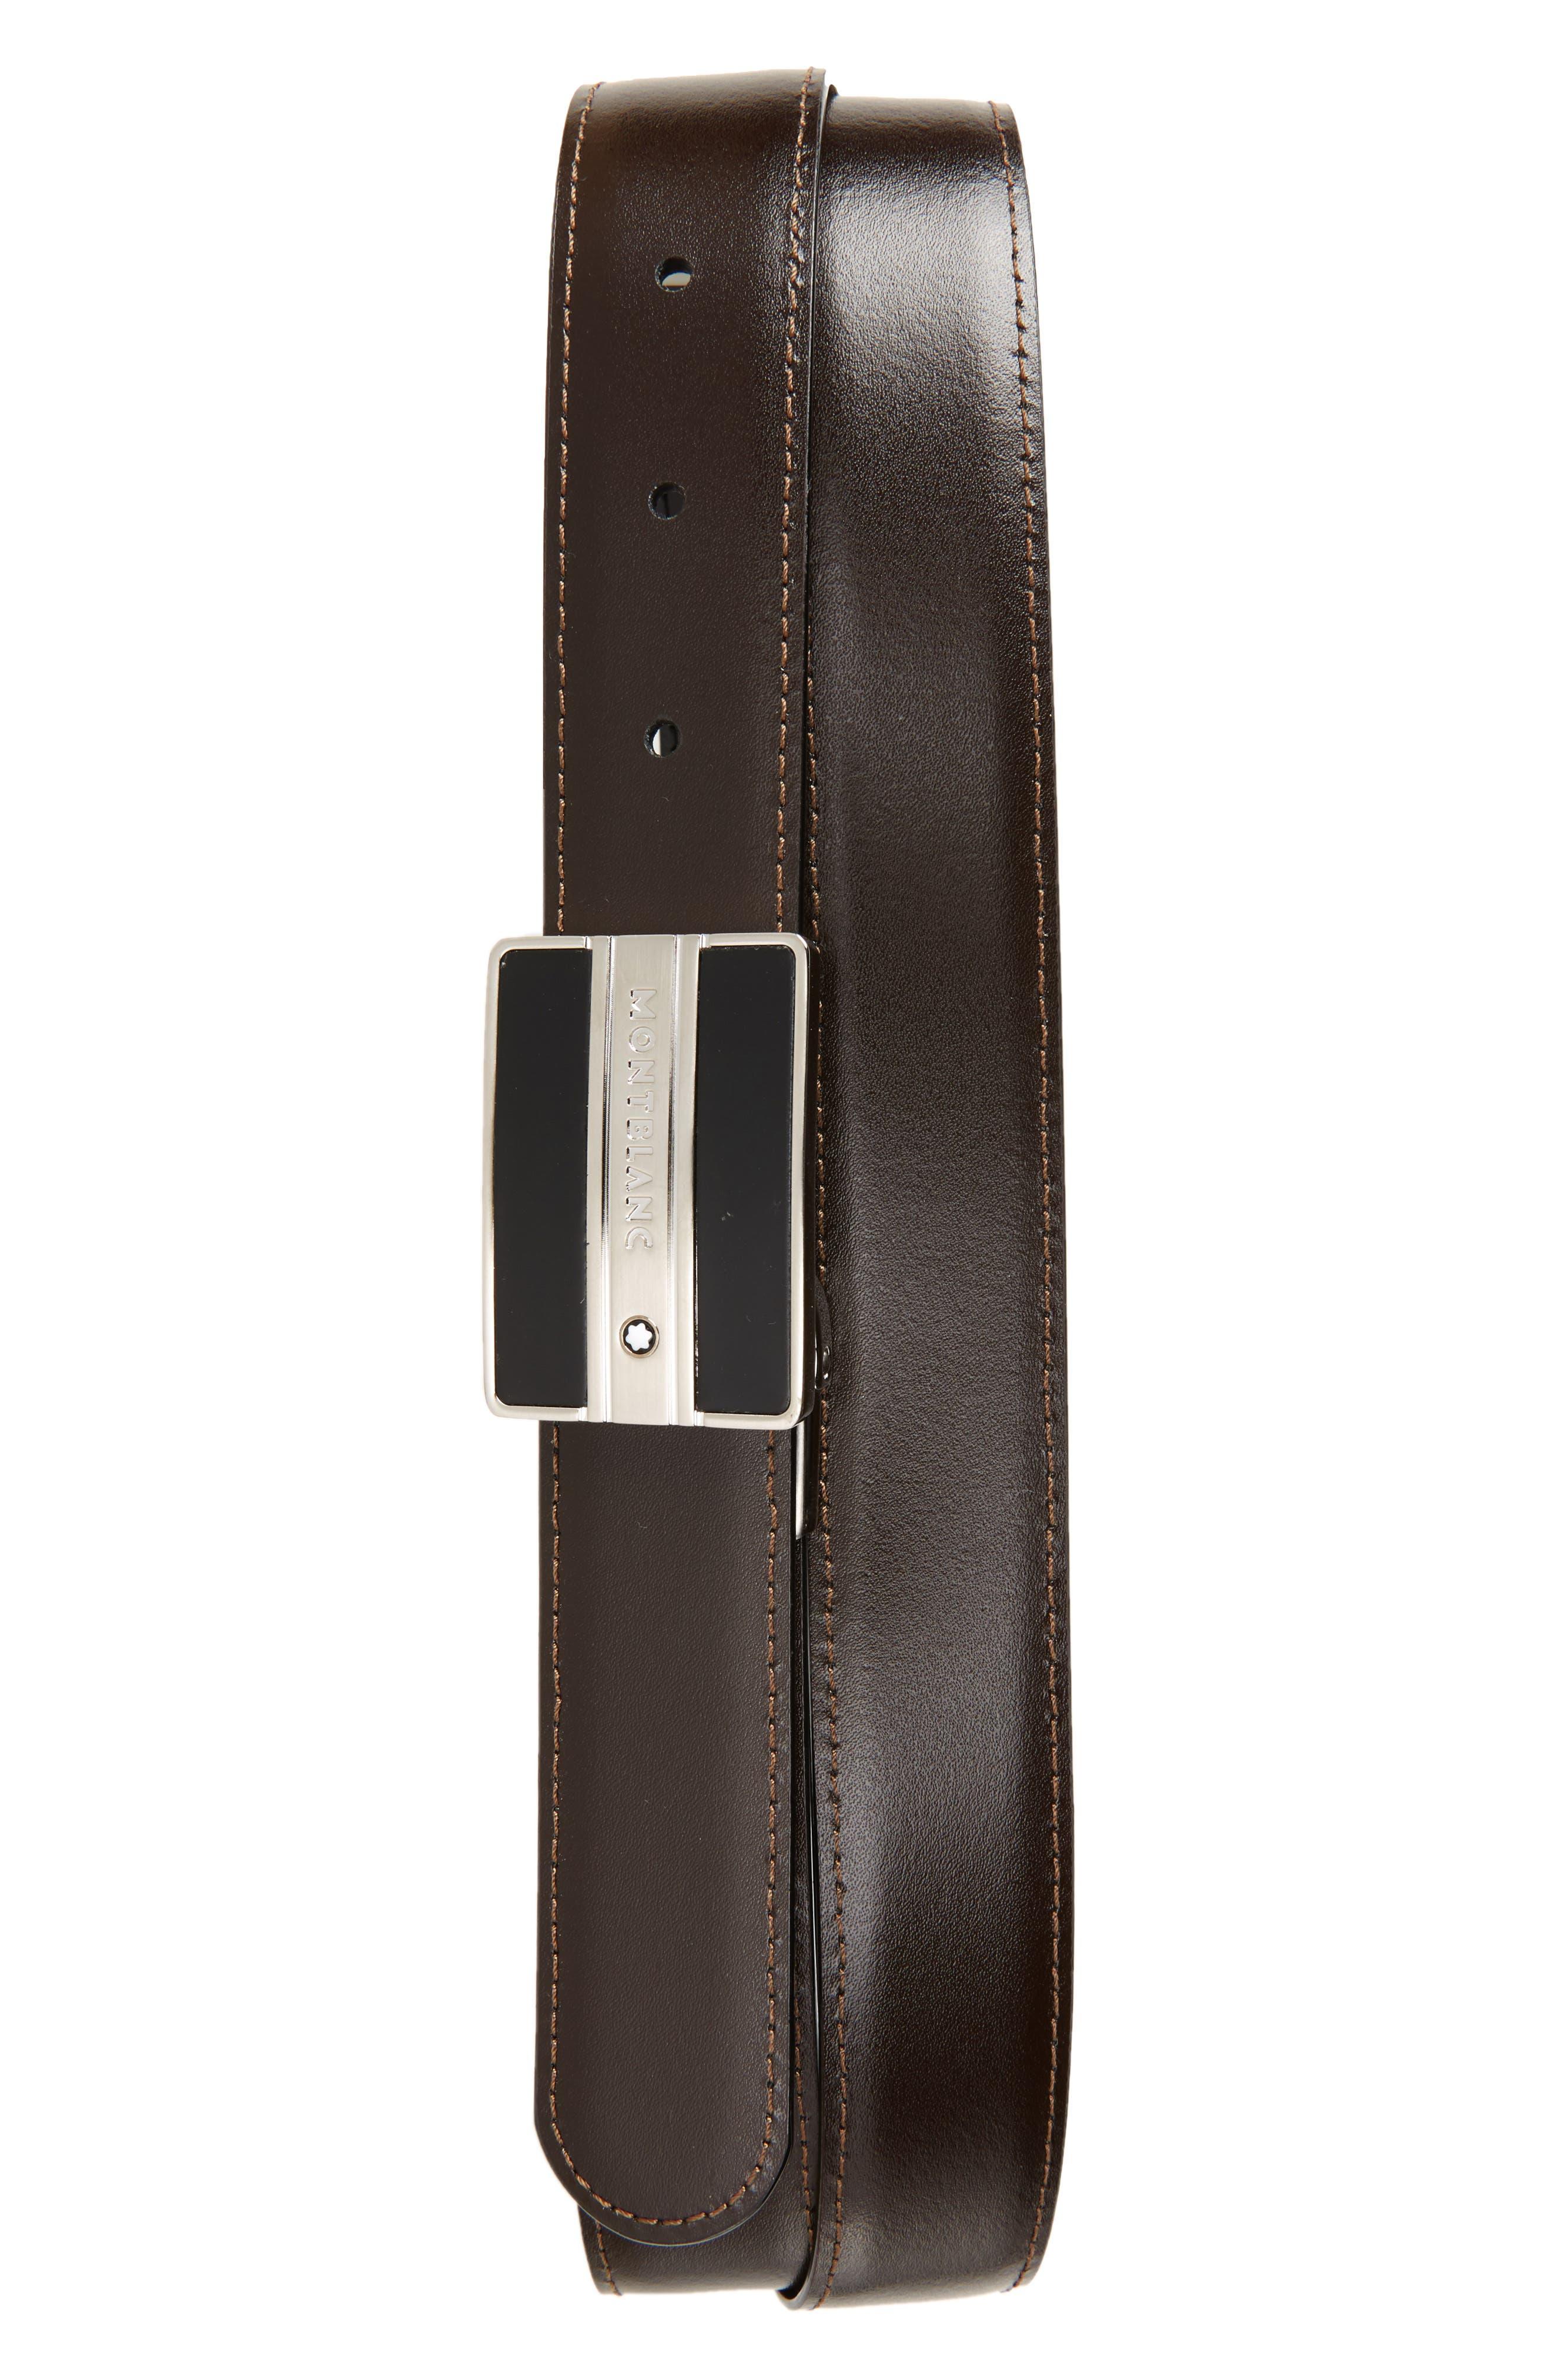 MONTBLANC, Meisterstück Buckle Reversible Leather Belt, Alternate thumbnail 2, color, BLACK/ BROWN